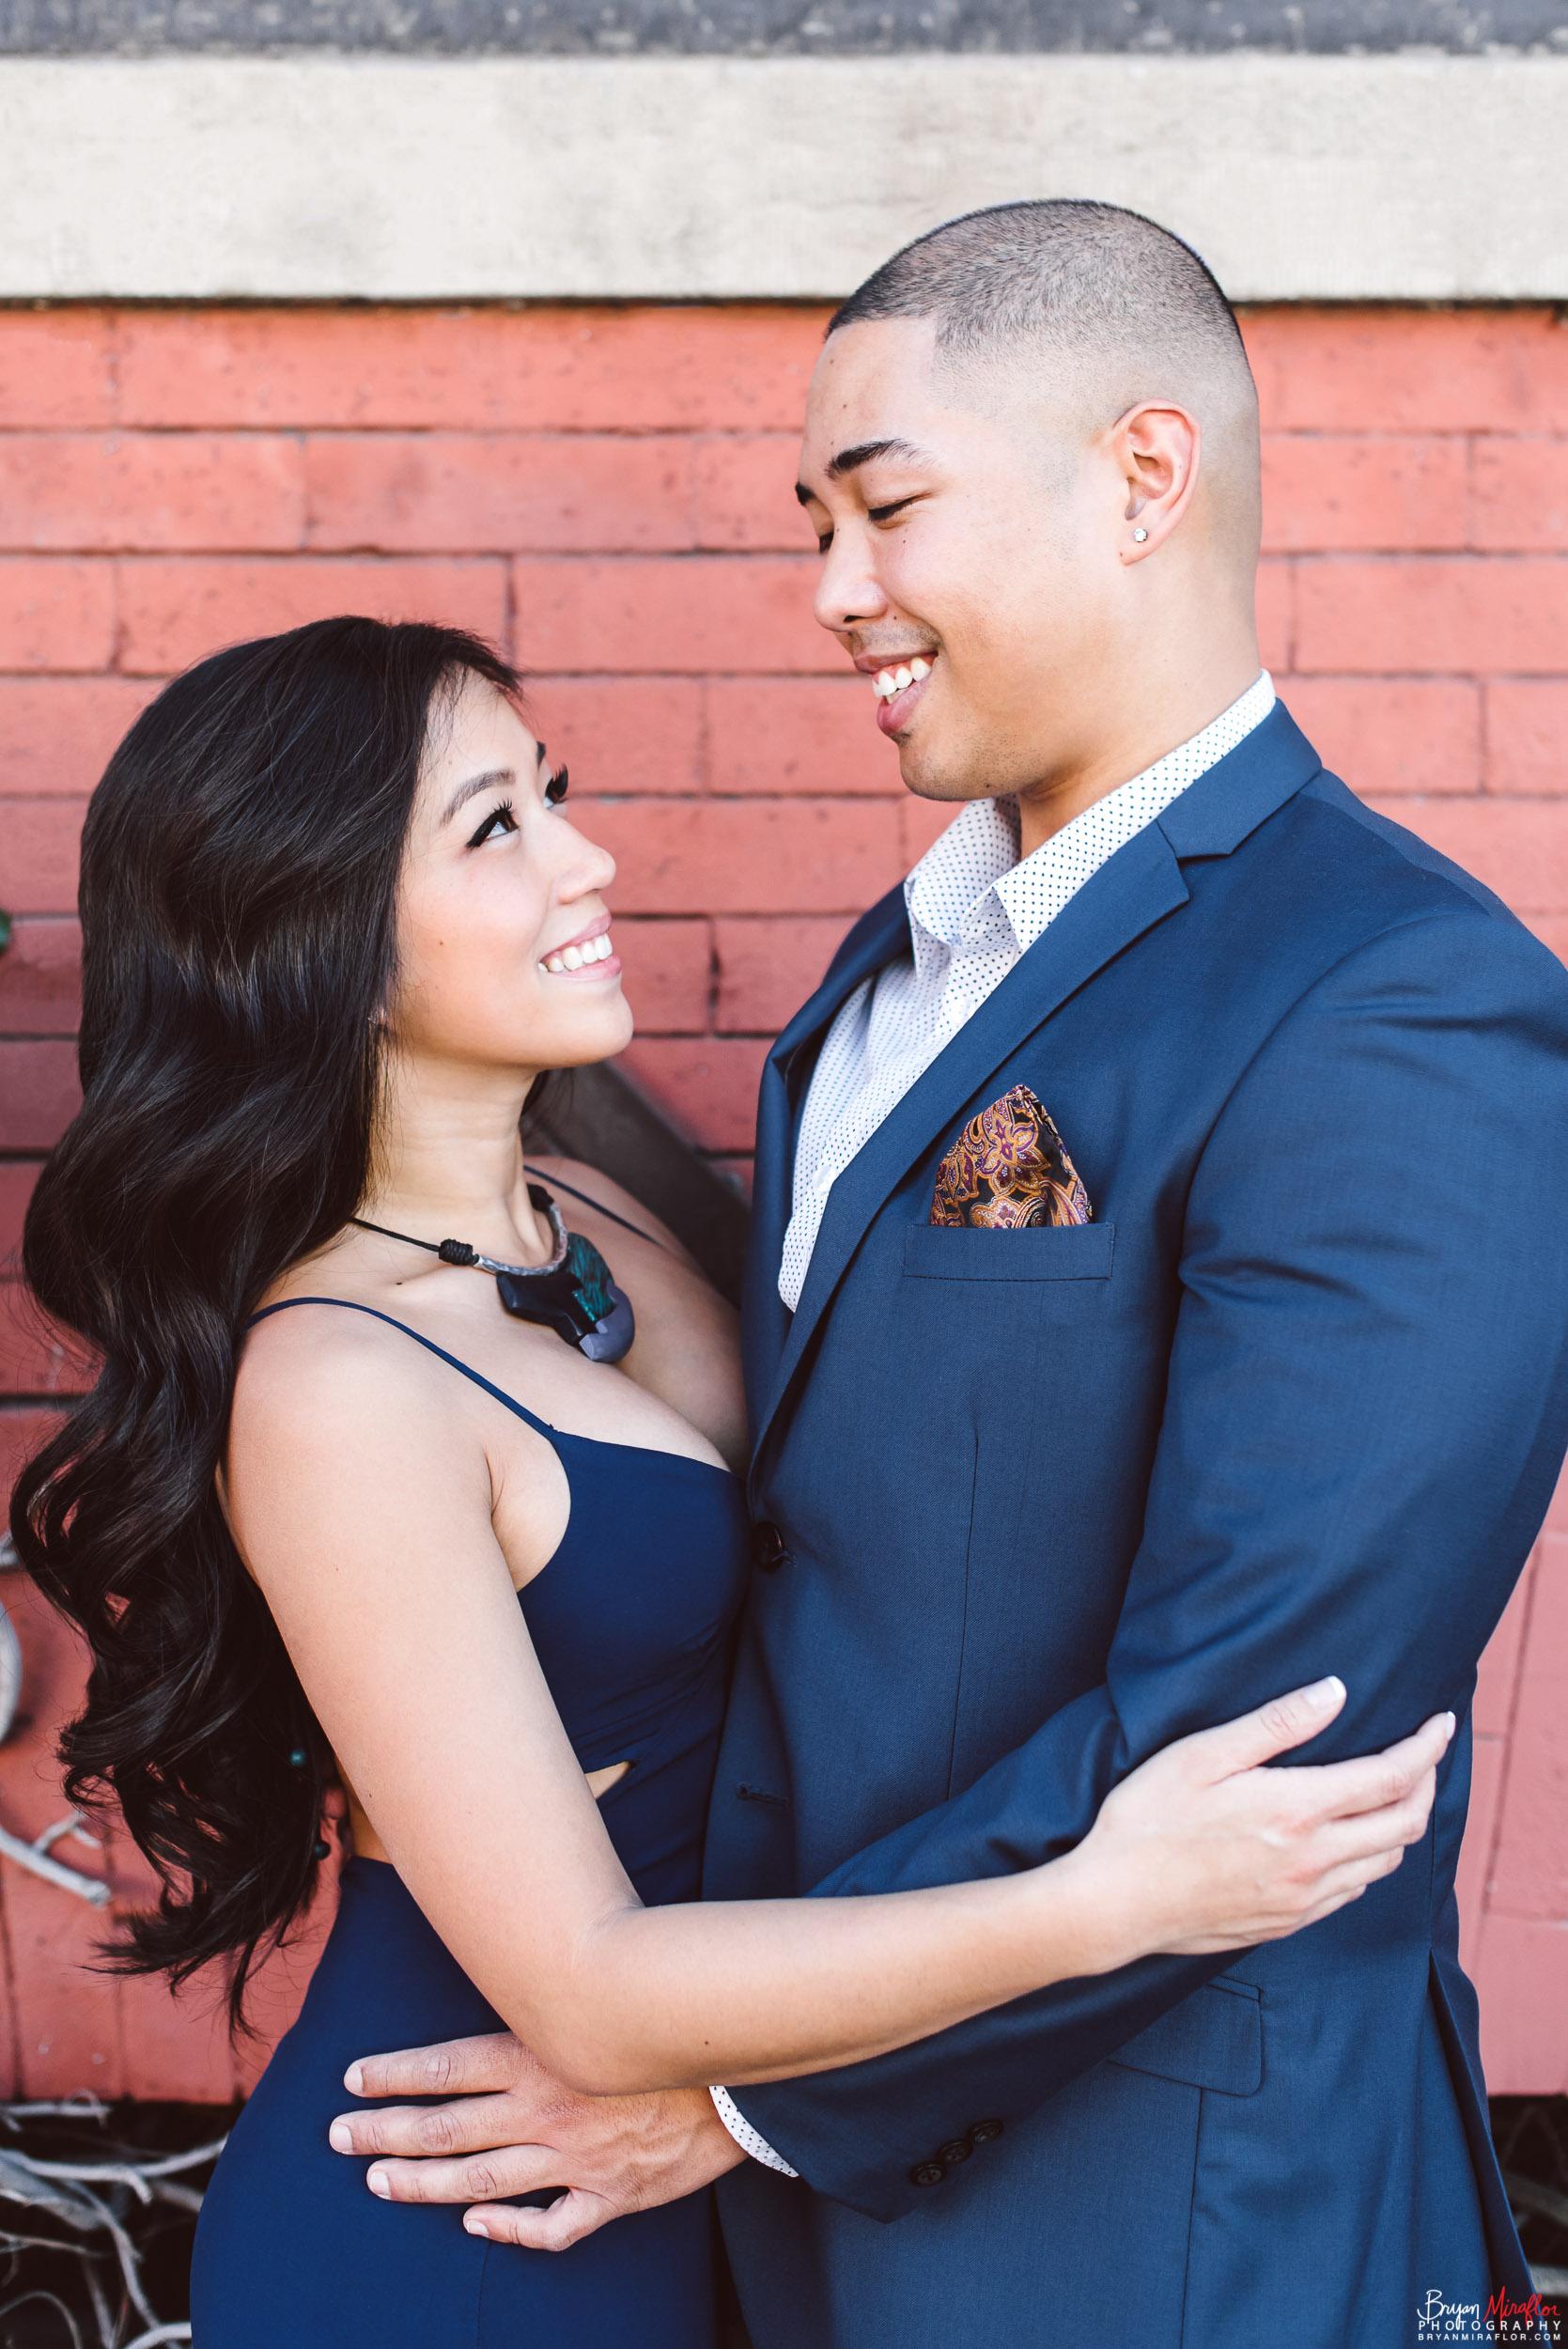 Bryan-Miraflor-Photography-Trisha-Dexter-Lopez-Engagement-Formal-DTLA-Arts-20170129-0001-Edit.jpg